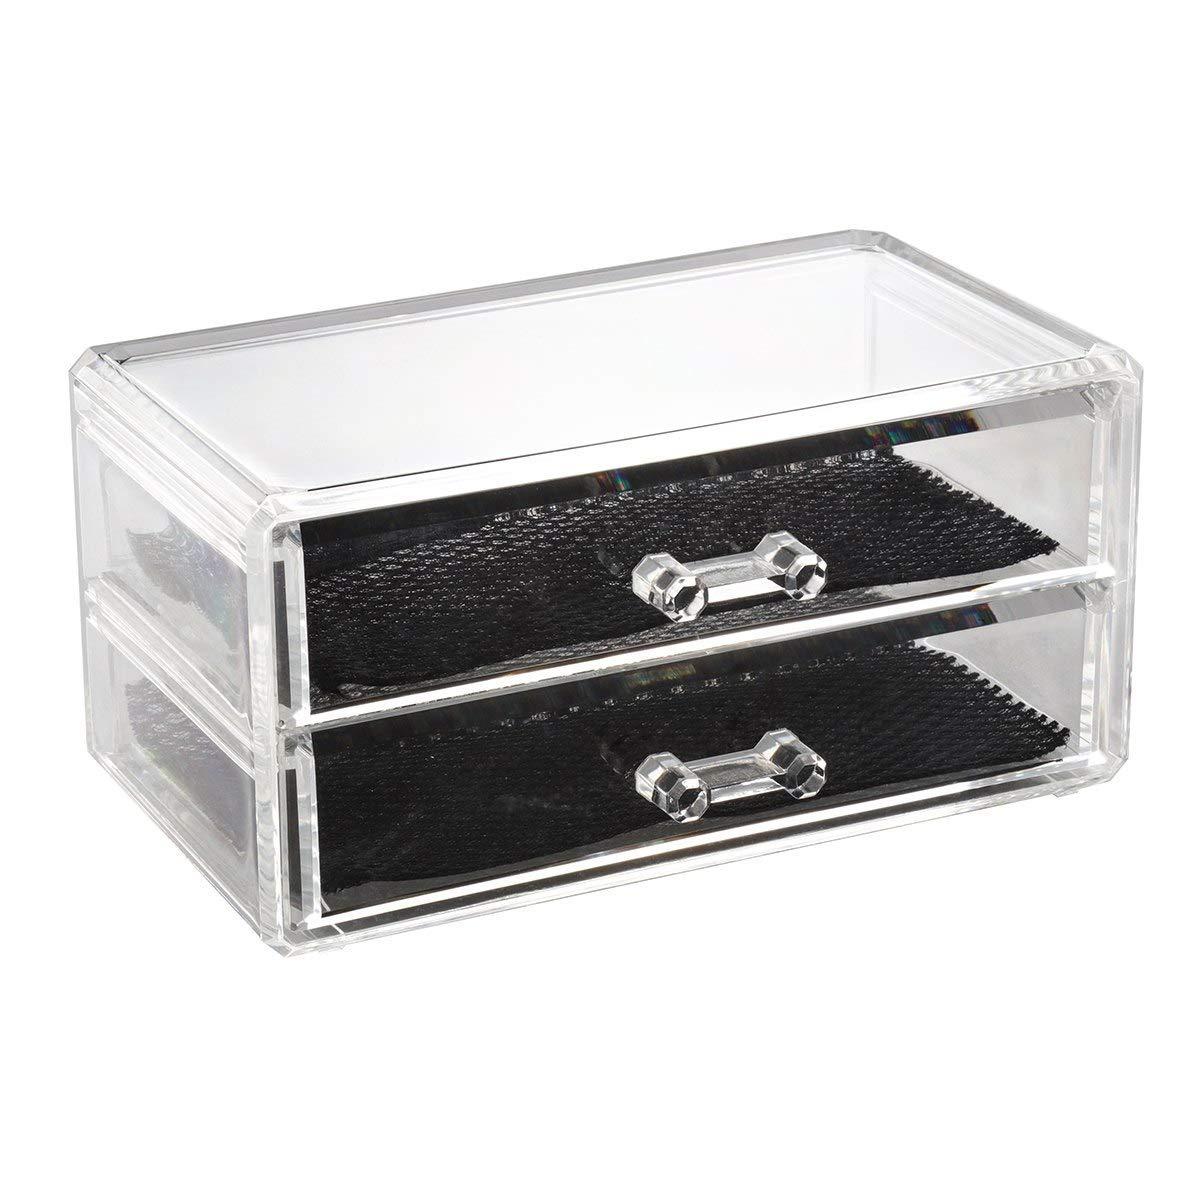 Get Quotations · Acrylic Transparent Makeup Storage Organizer Makeup  Organizer For Bathroom Makeup Organizer For Desk